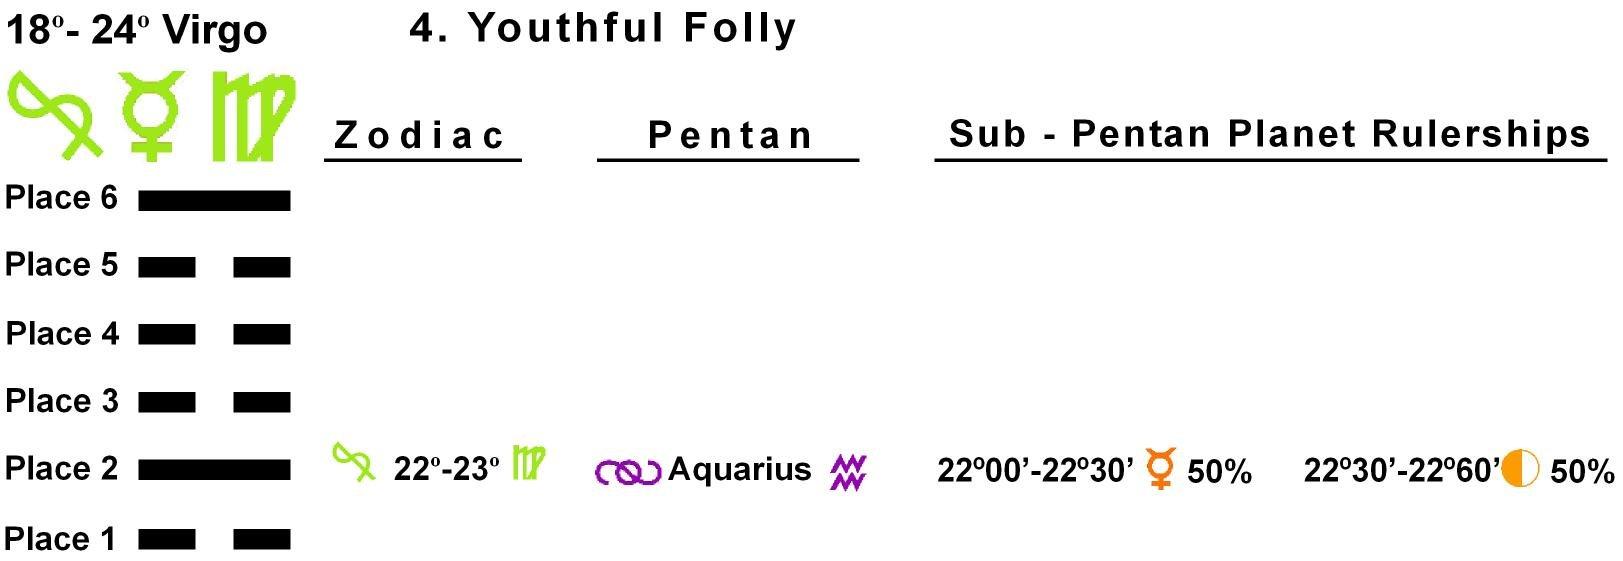 Pent-lines-06VI 22-23 Hx-04 Youthful Folly